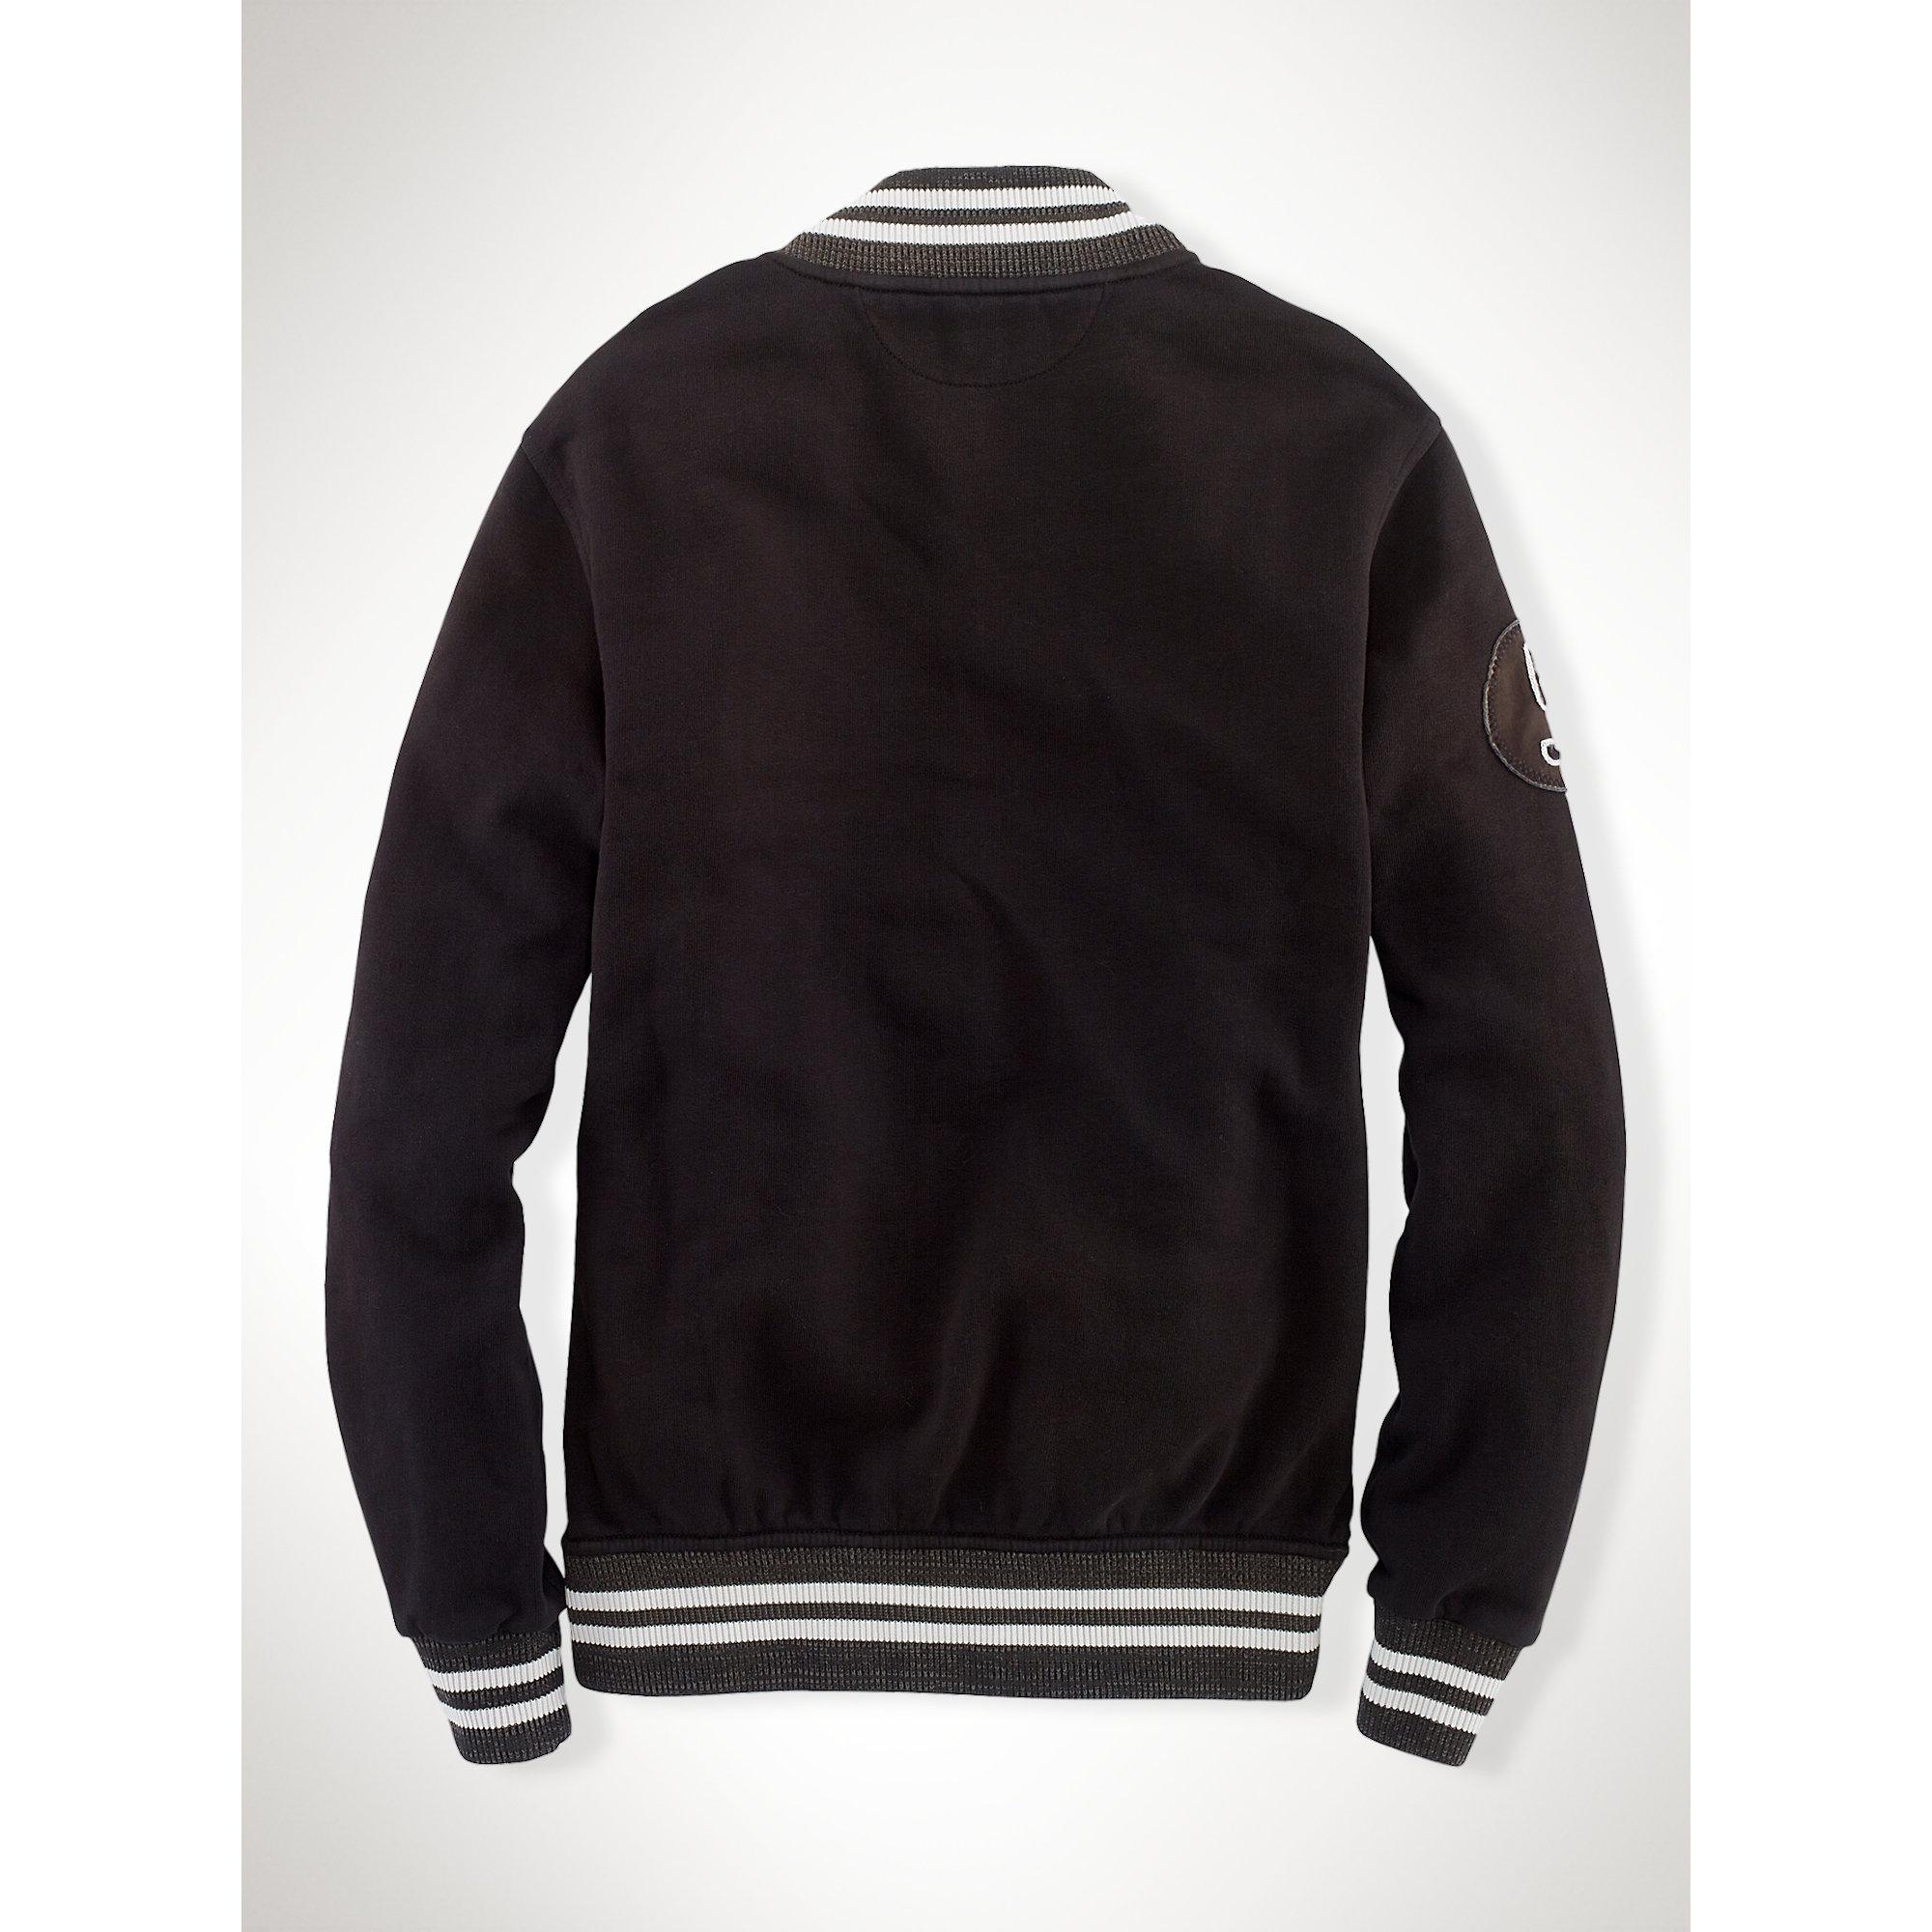 polo ralph lauren ny fleece baseball jacket in black for men lyst. Black Bedroom Furniture Sets. Home Design Ideas